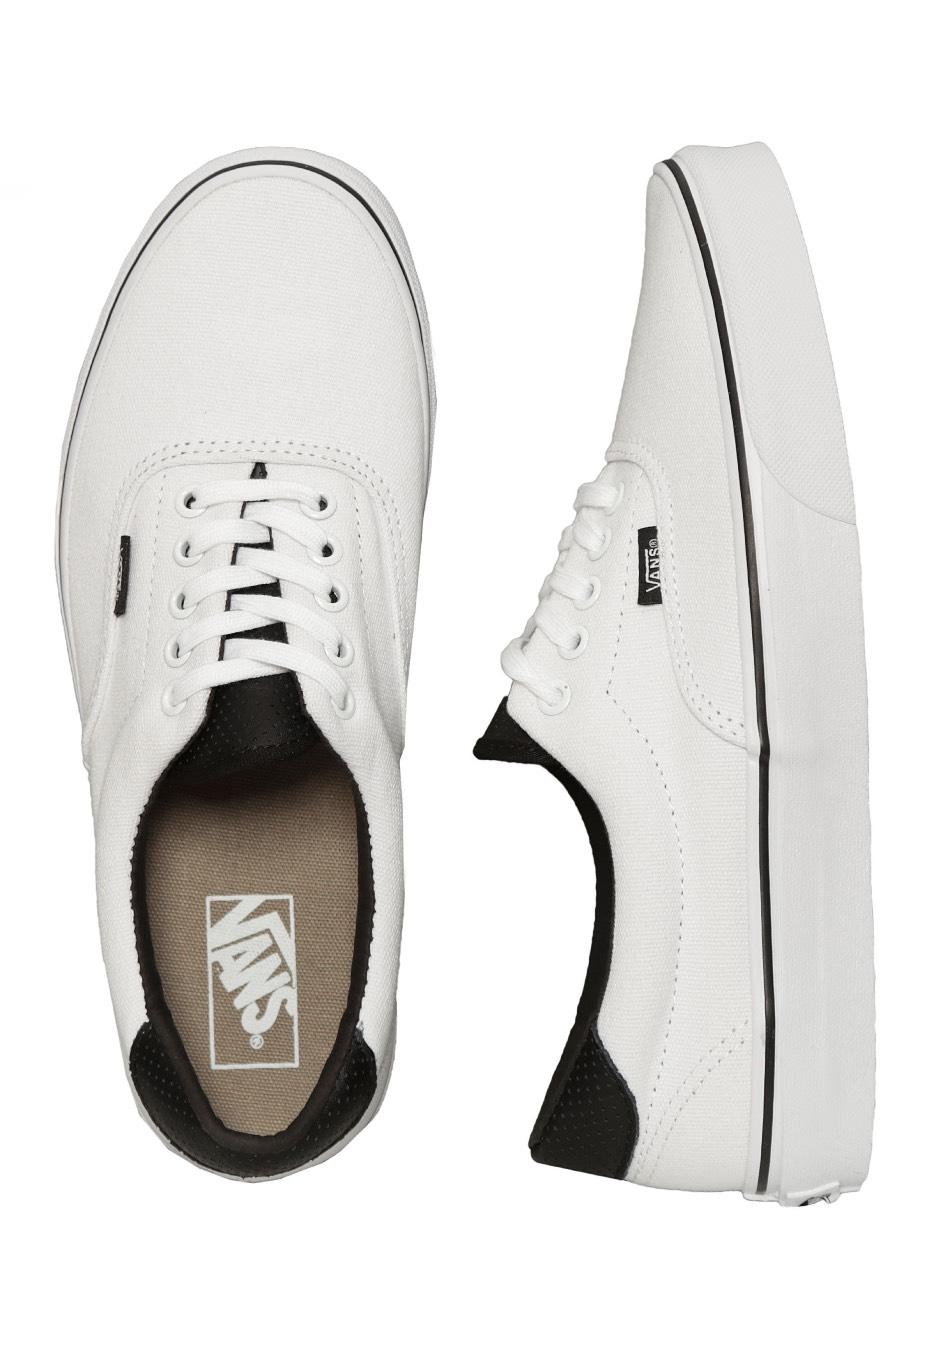 Vans - Era 59 C P True White Black - Shoes - Impericon.com UK eca9d37e07